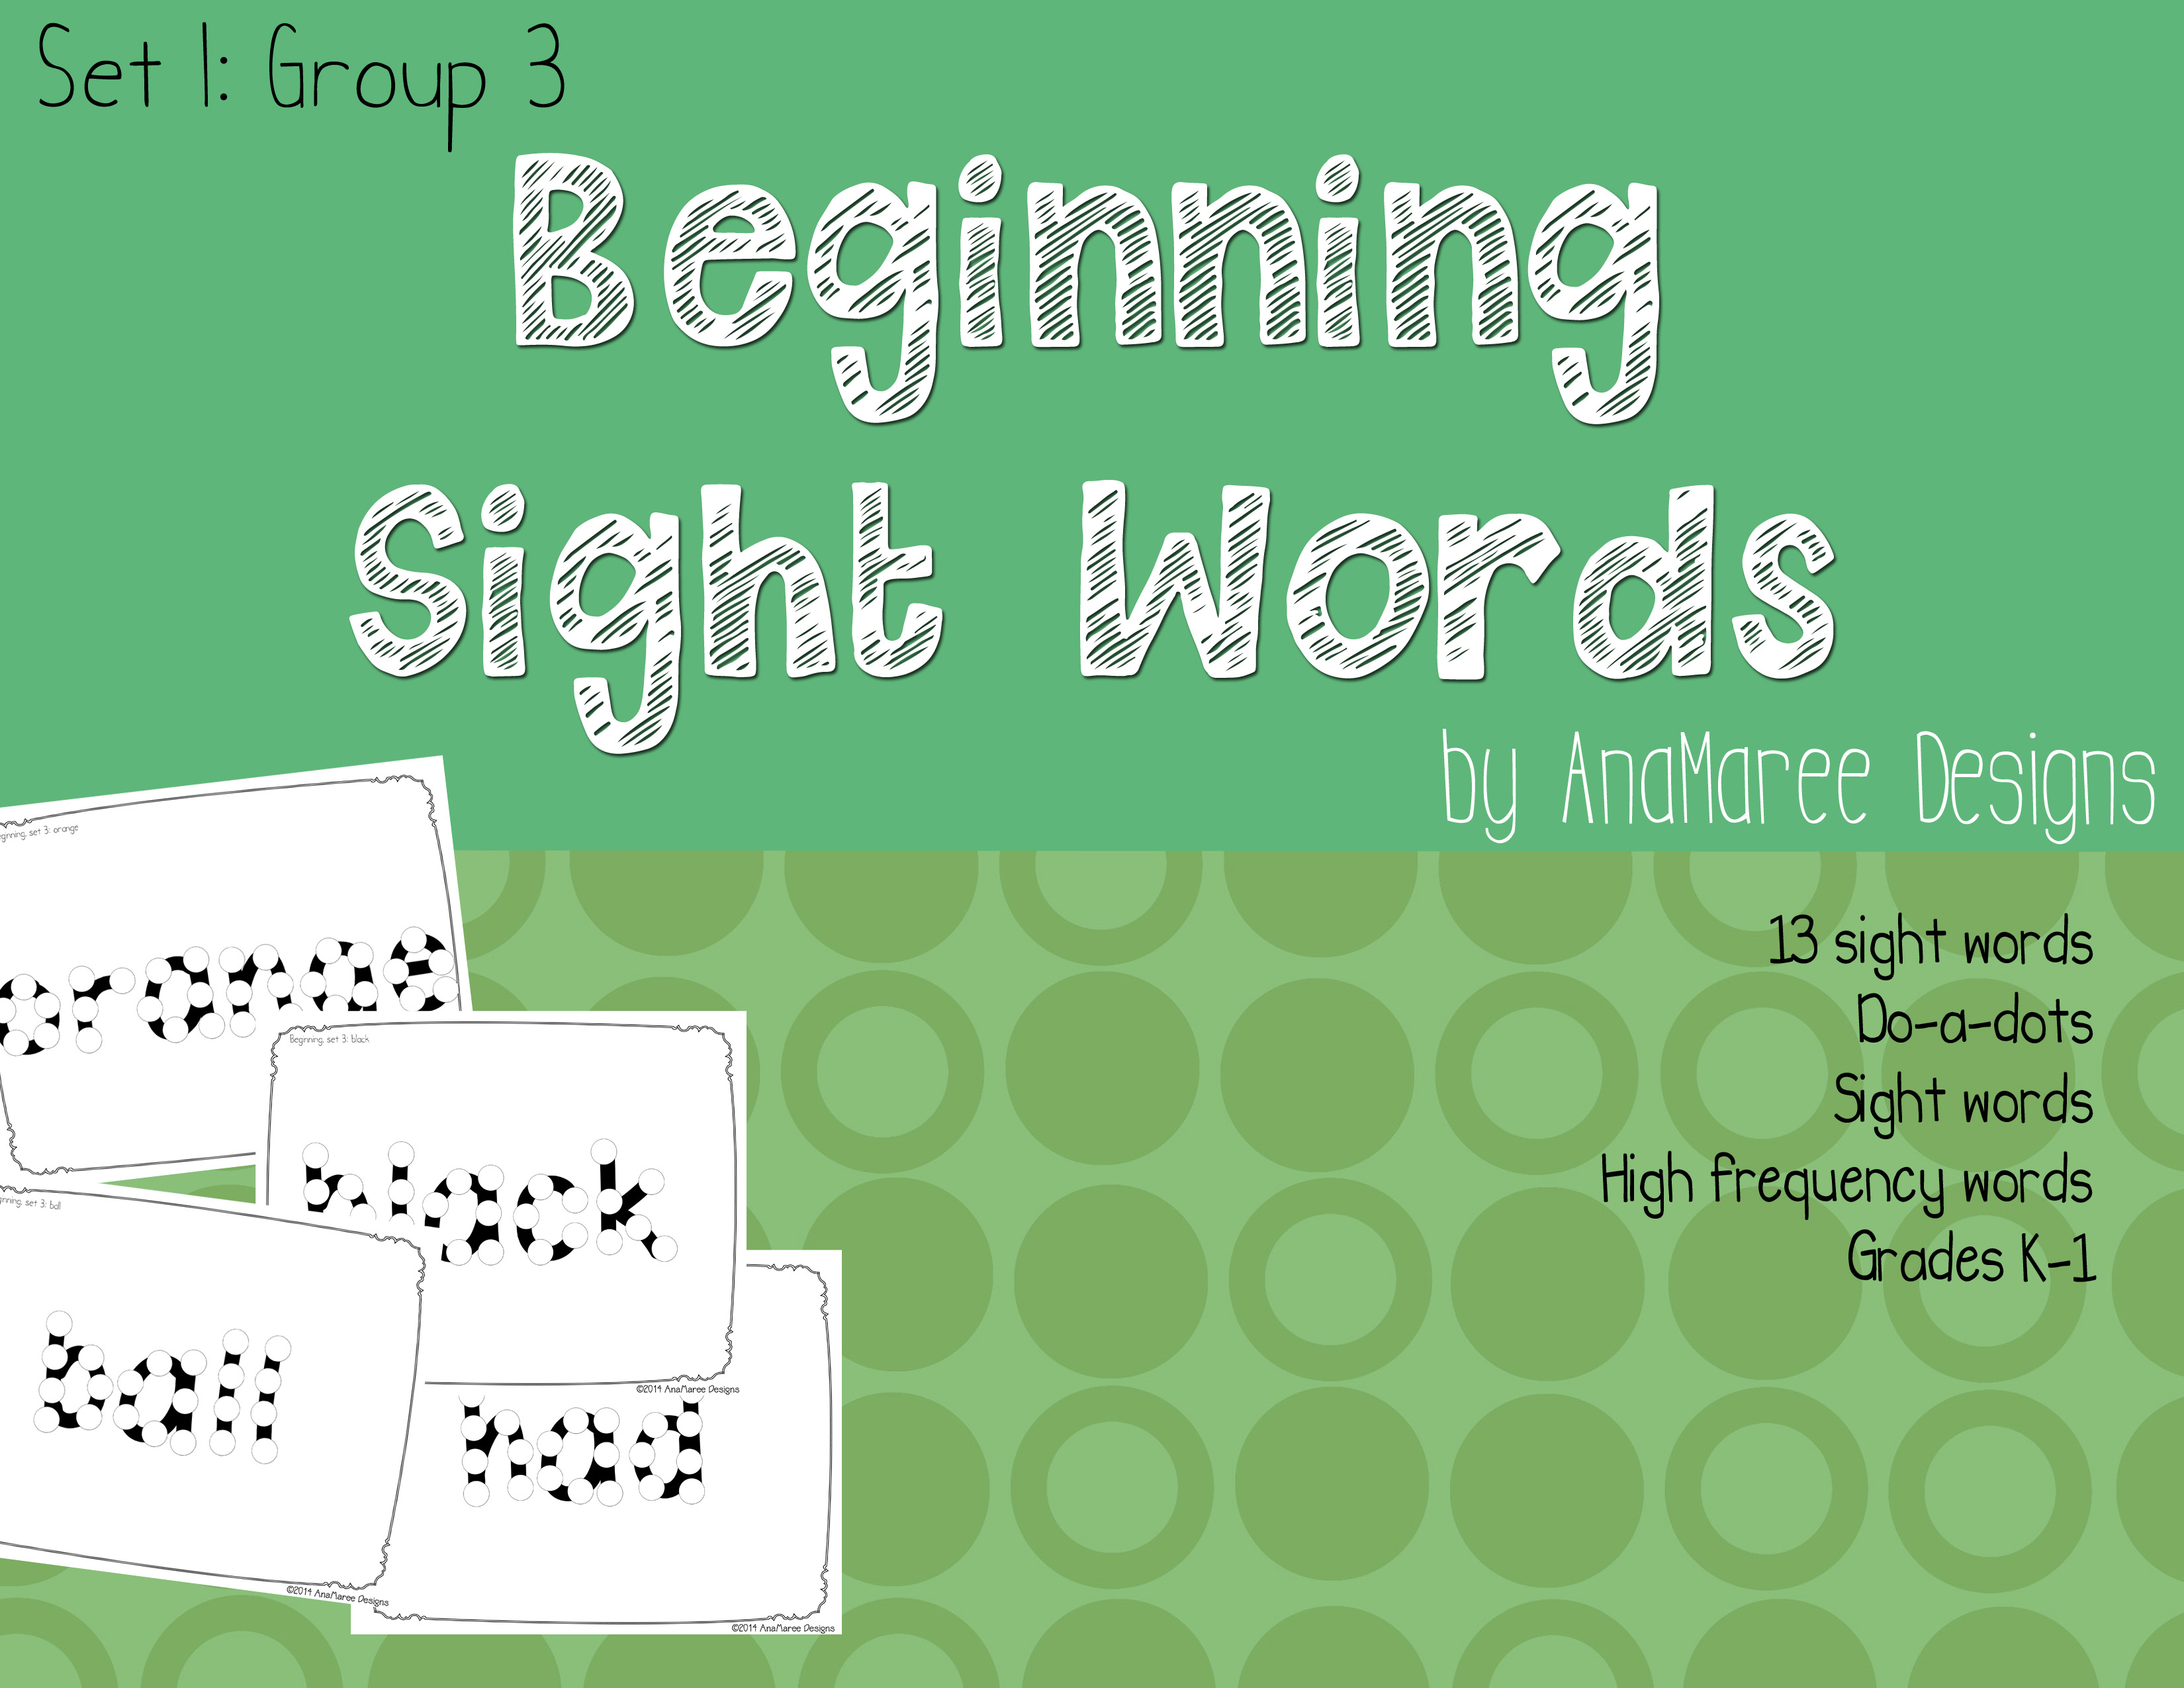 Sight Words Set 1 Group 3 Anamaree Designs